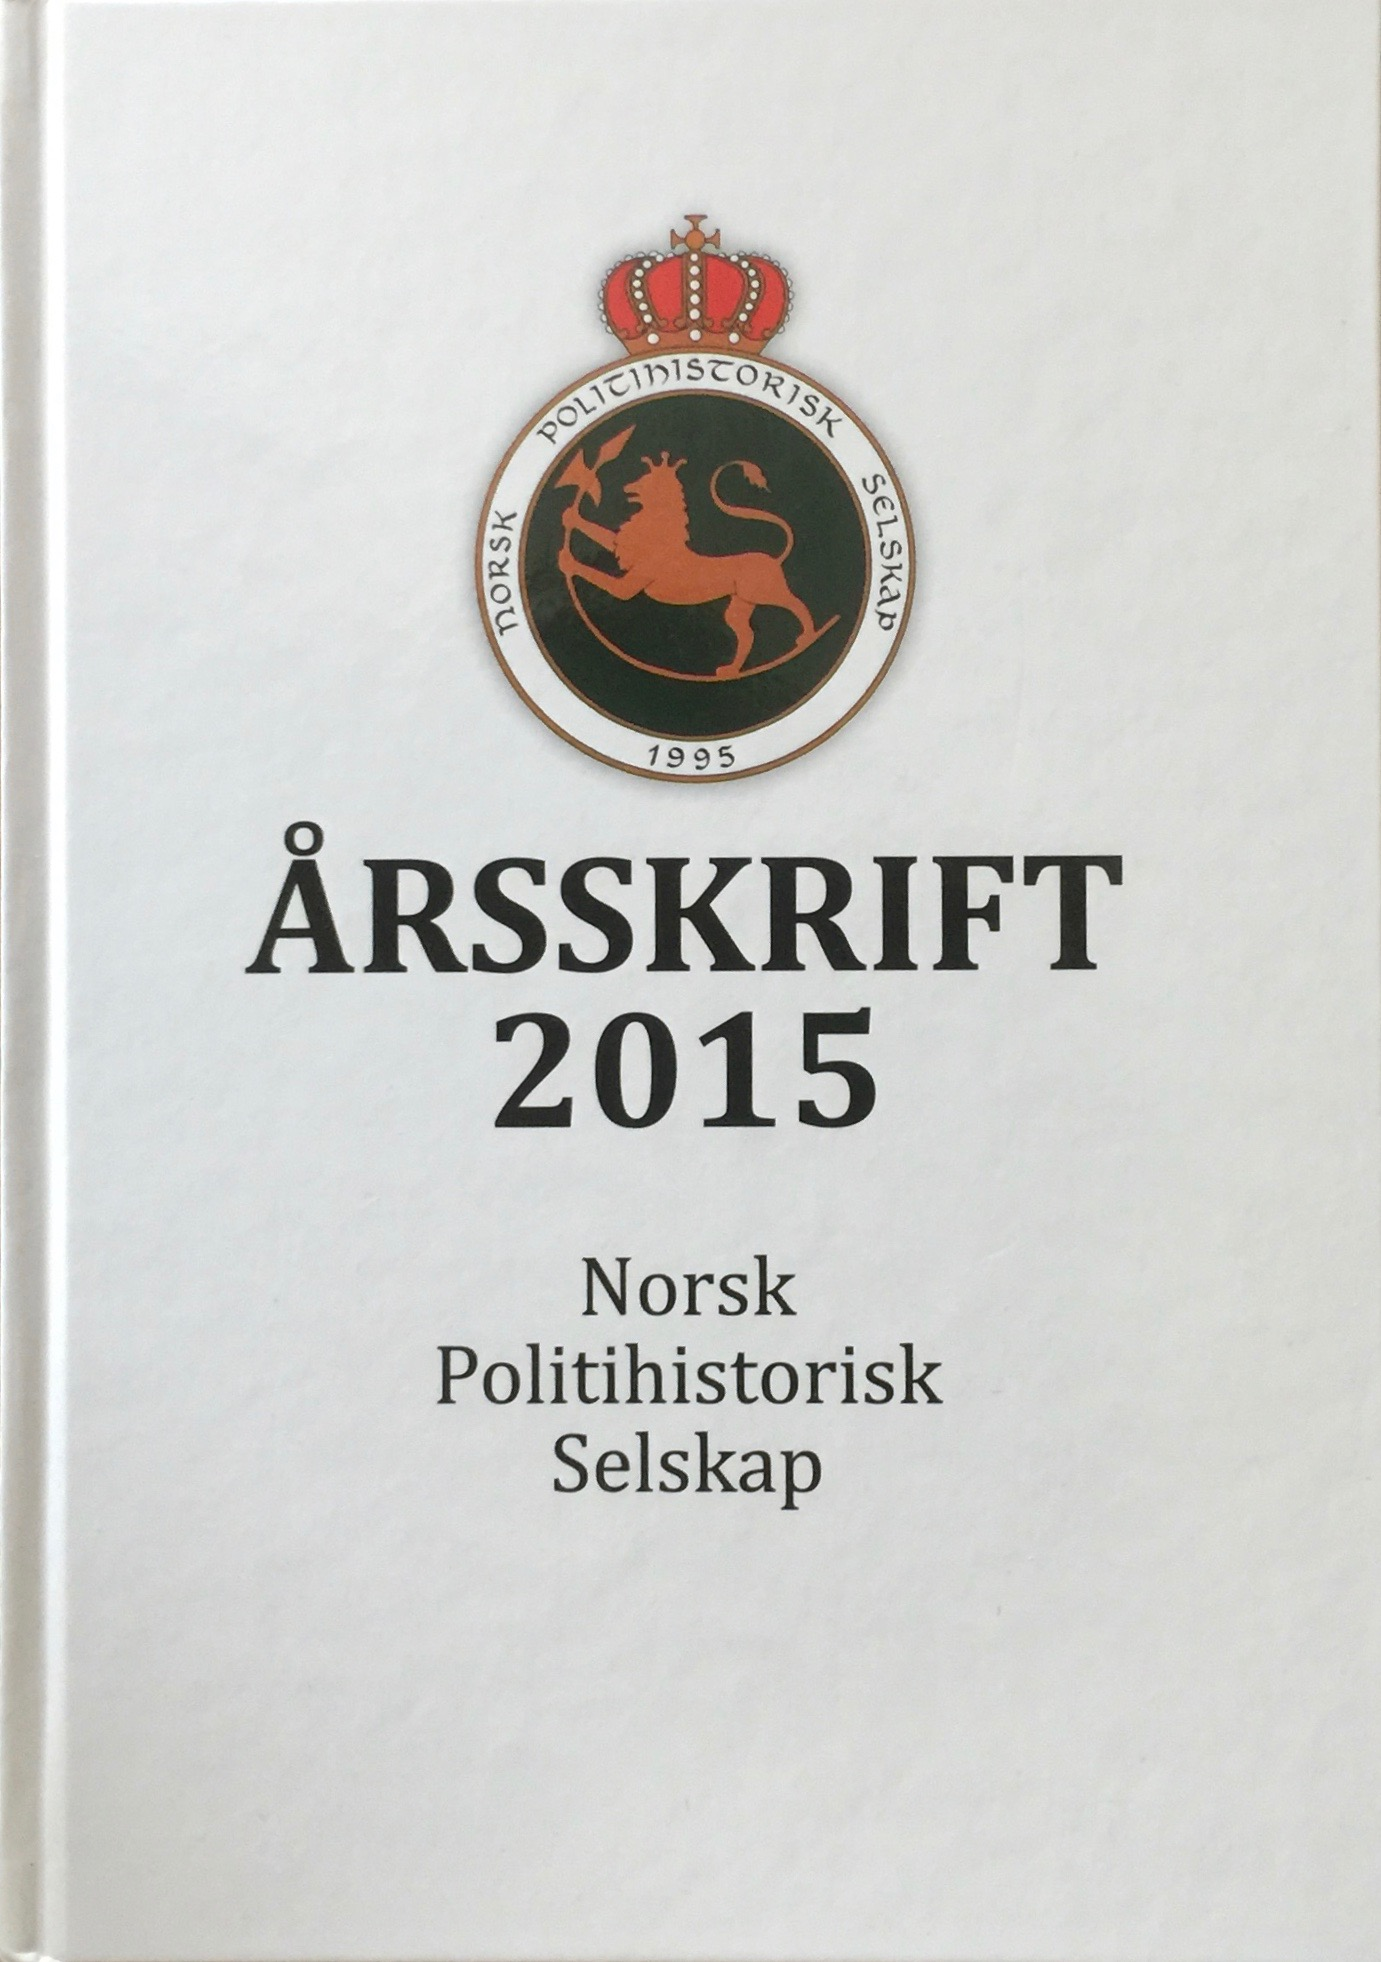 Årsskrift 2015